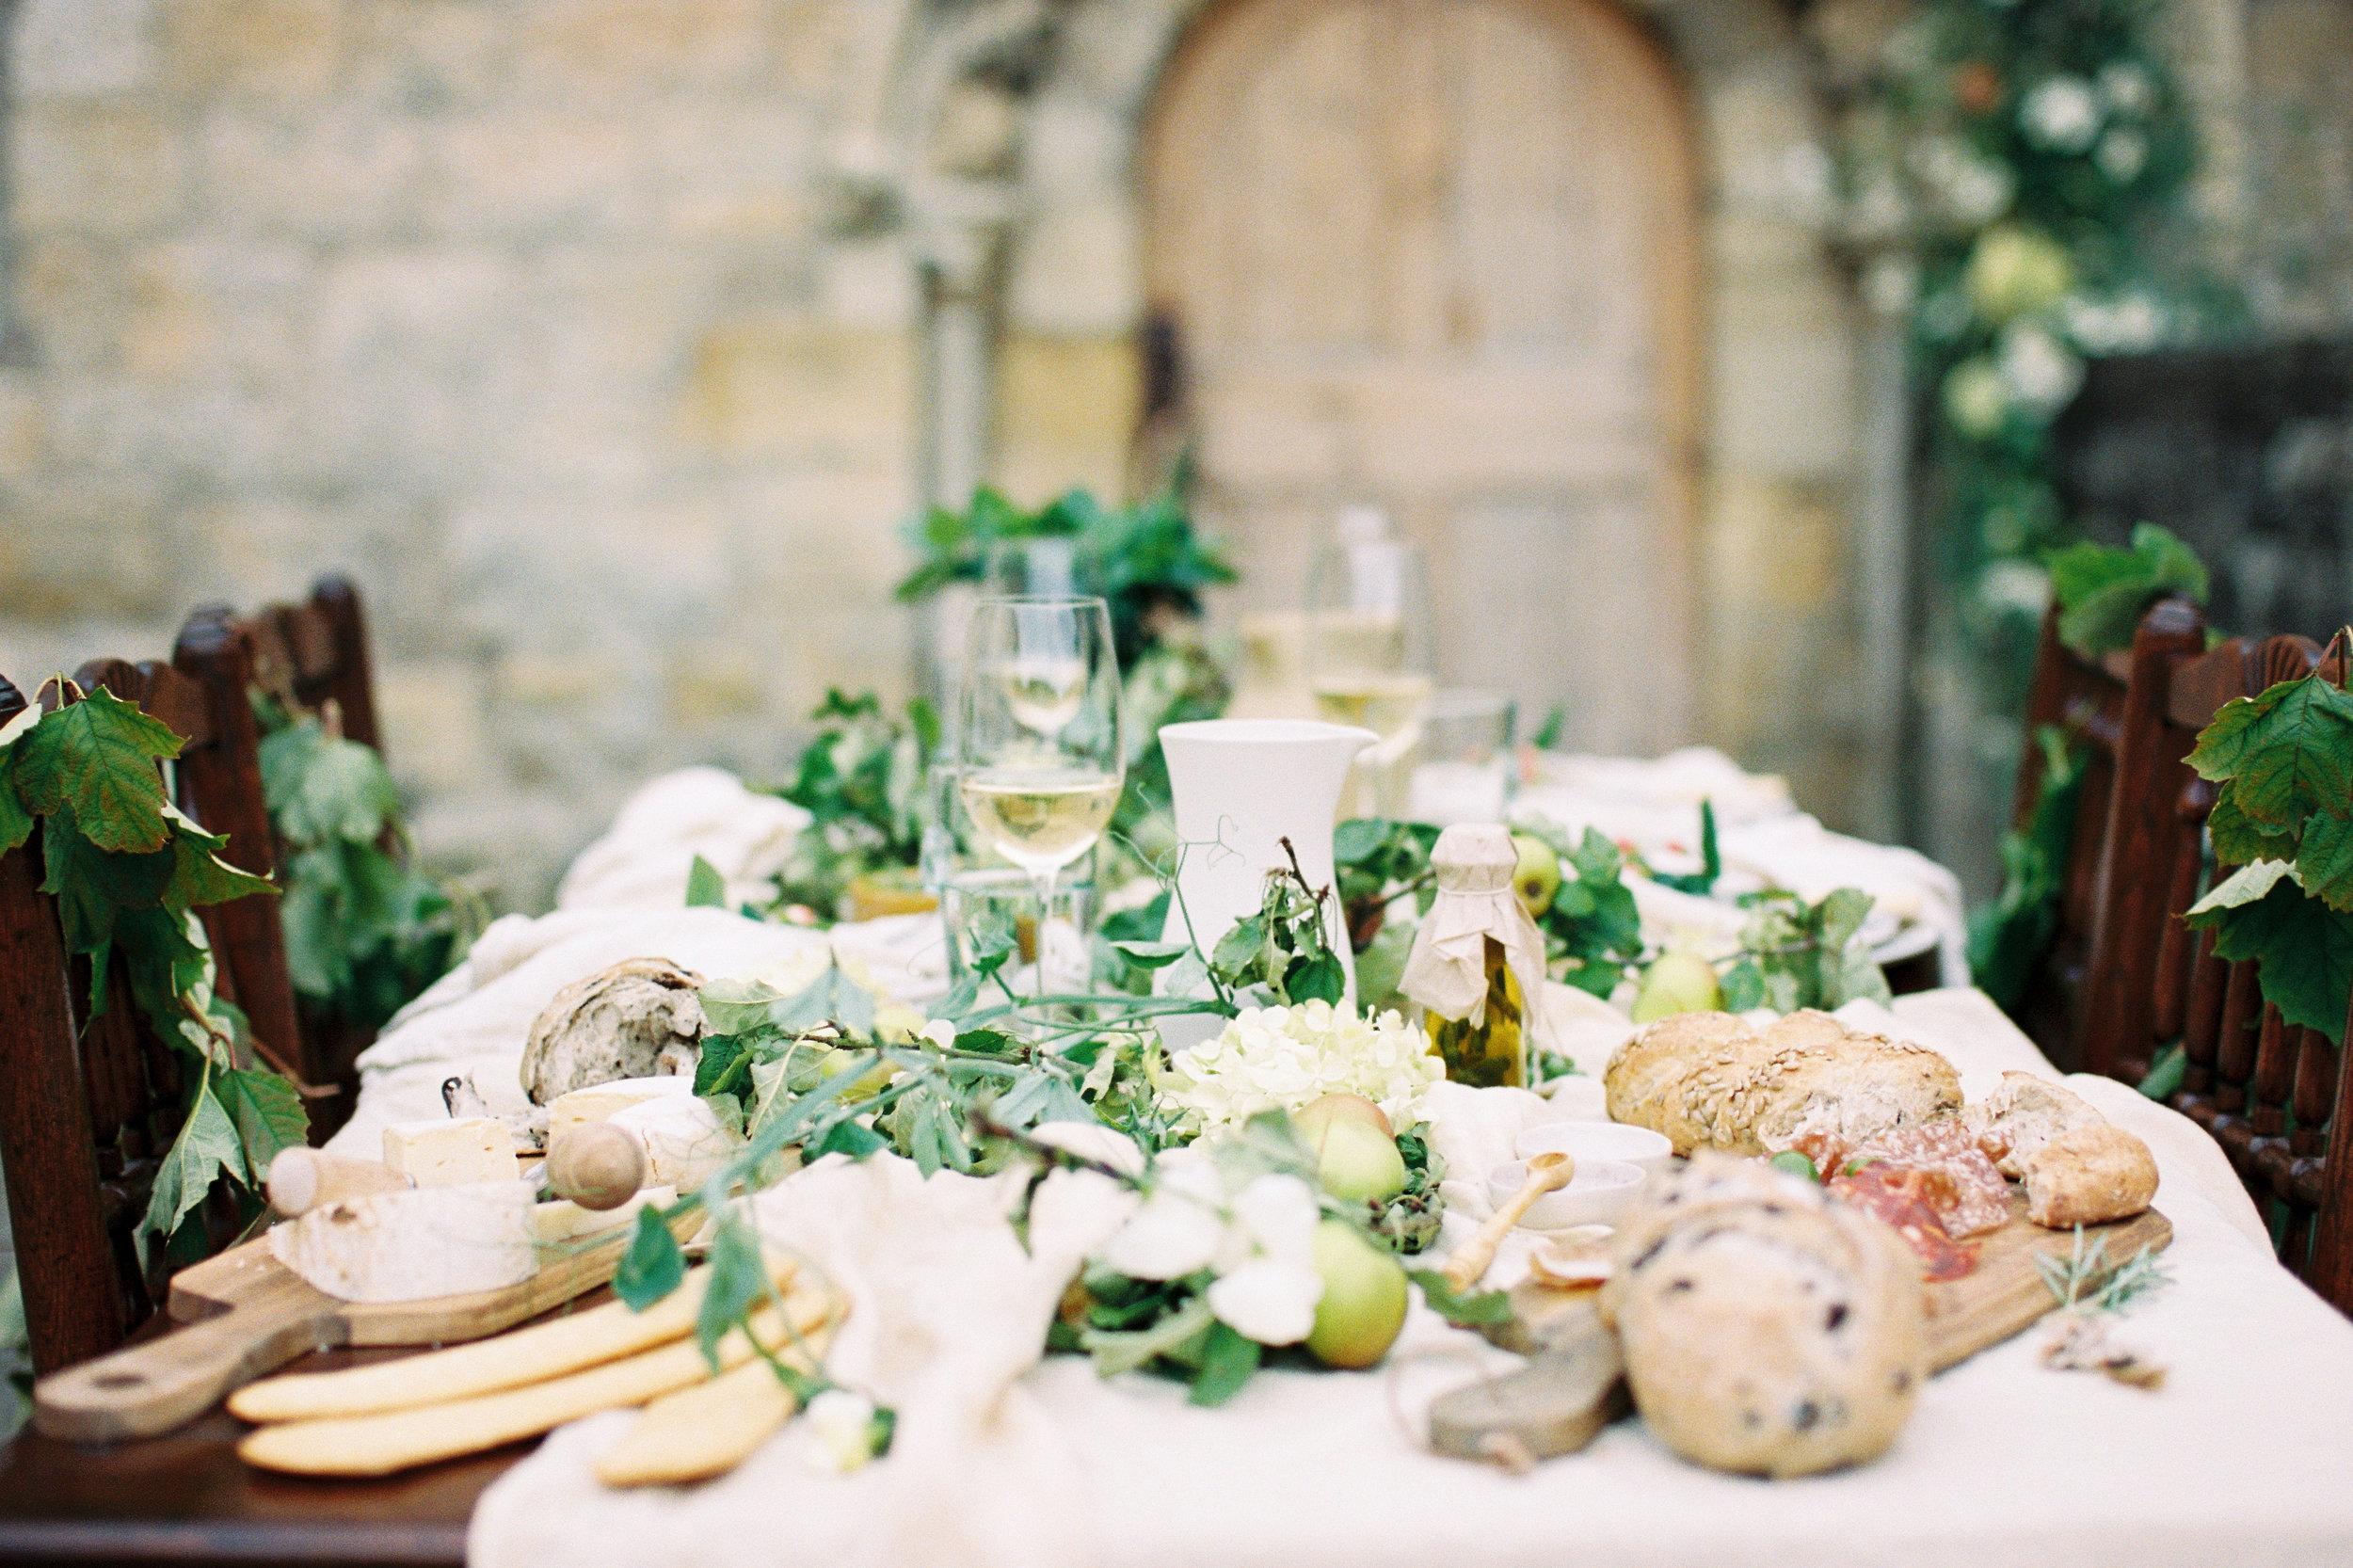 Seasonal floral table setting